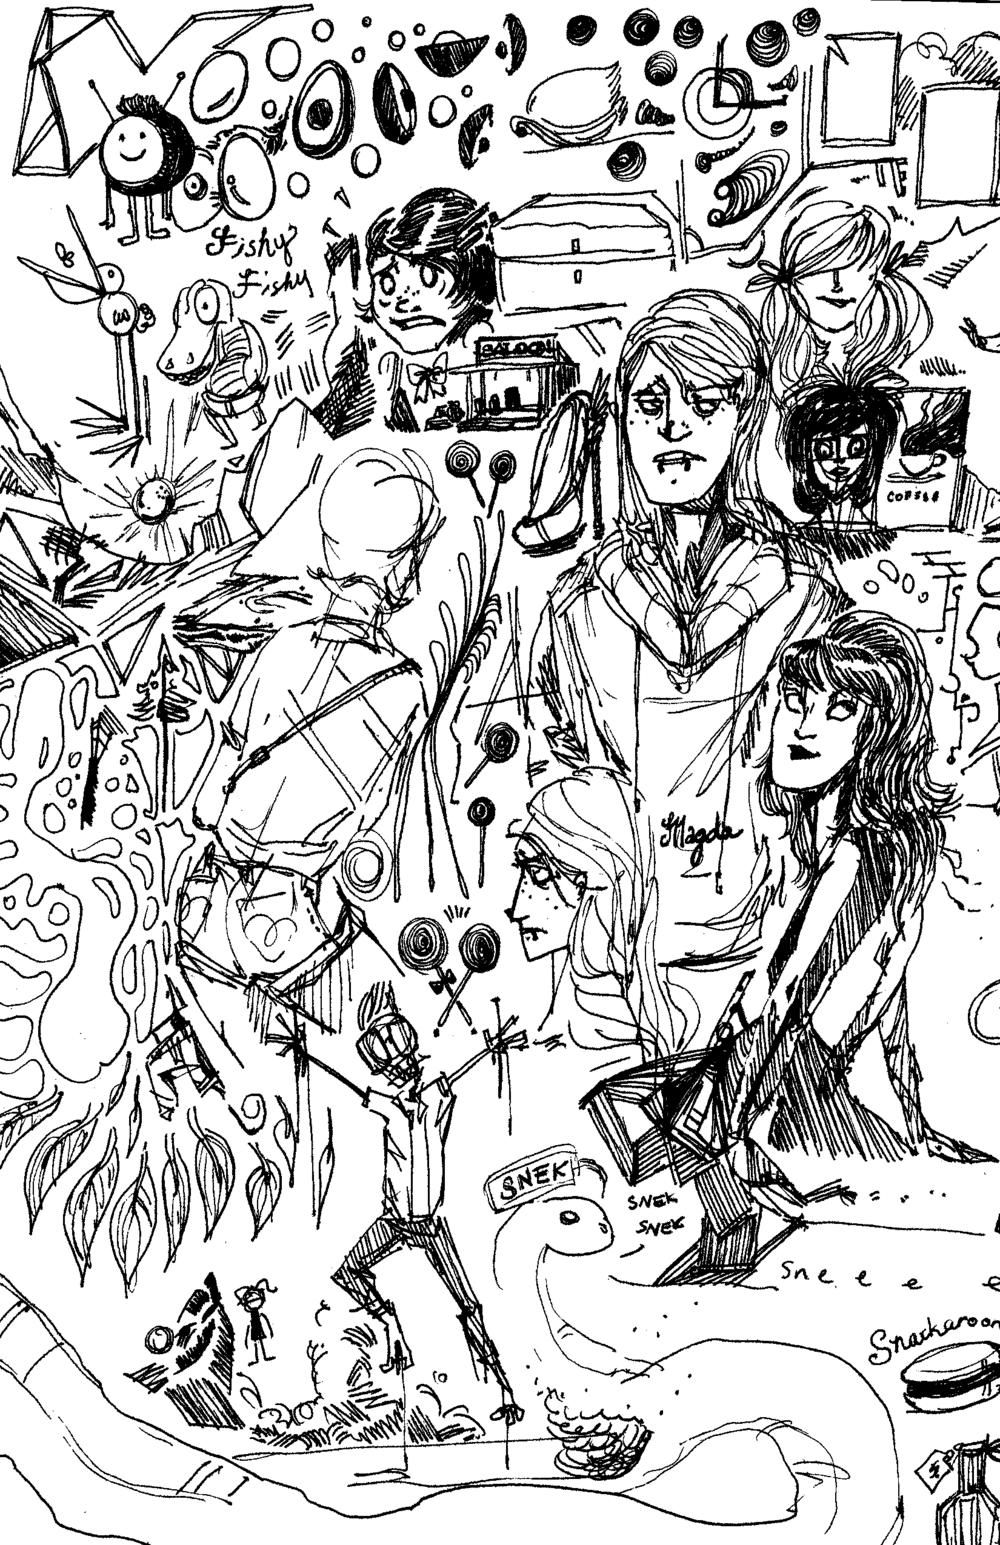 sketchbookBMP1cover.png